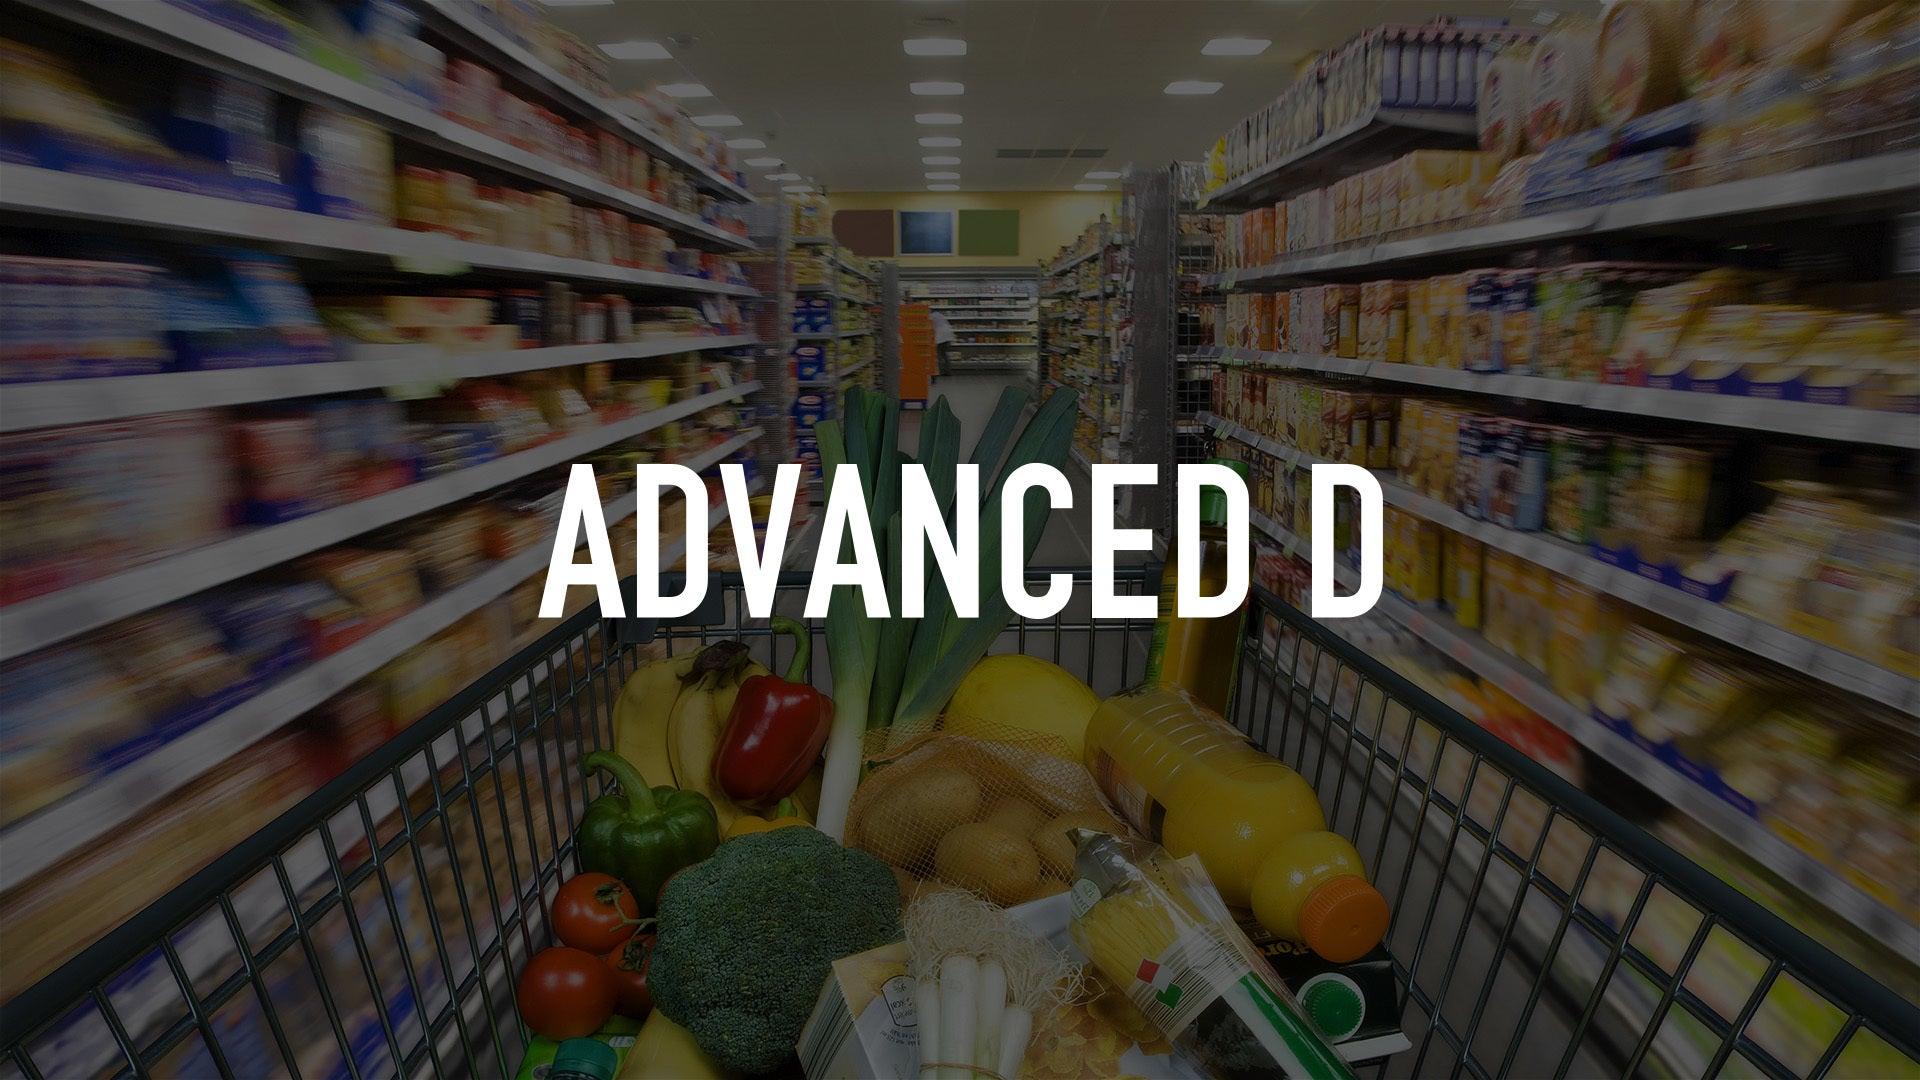 Advanced D